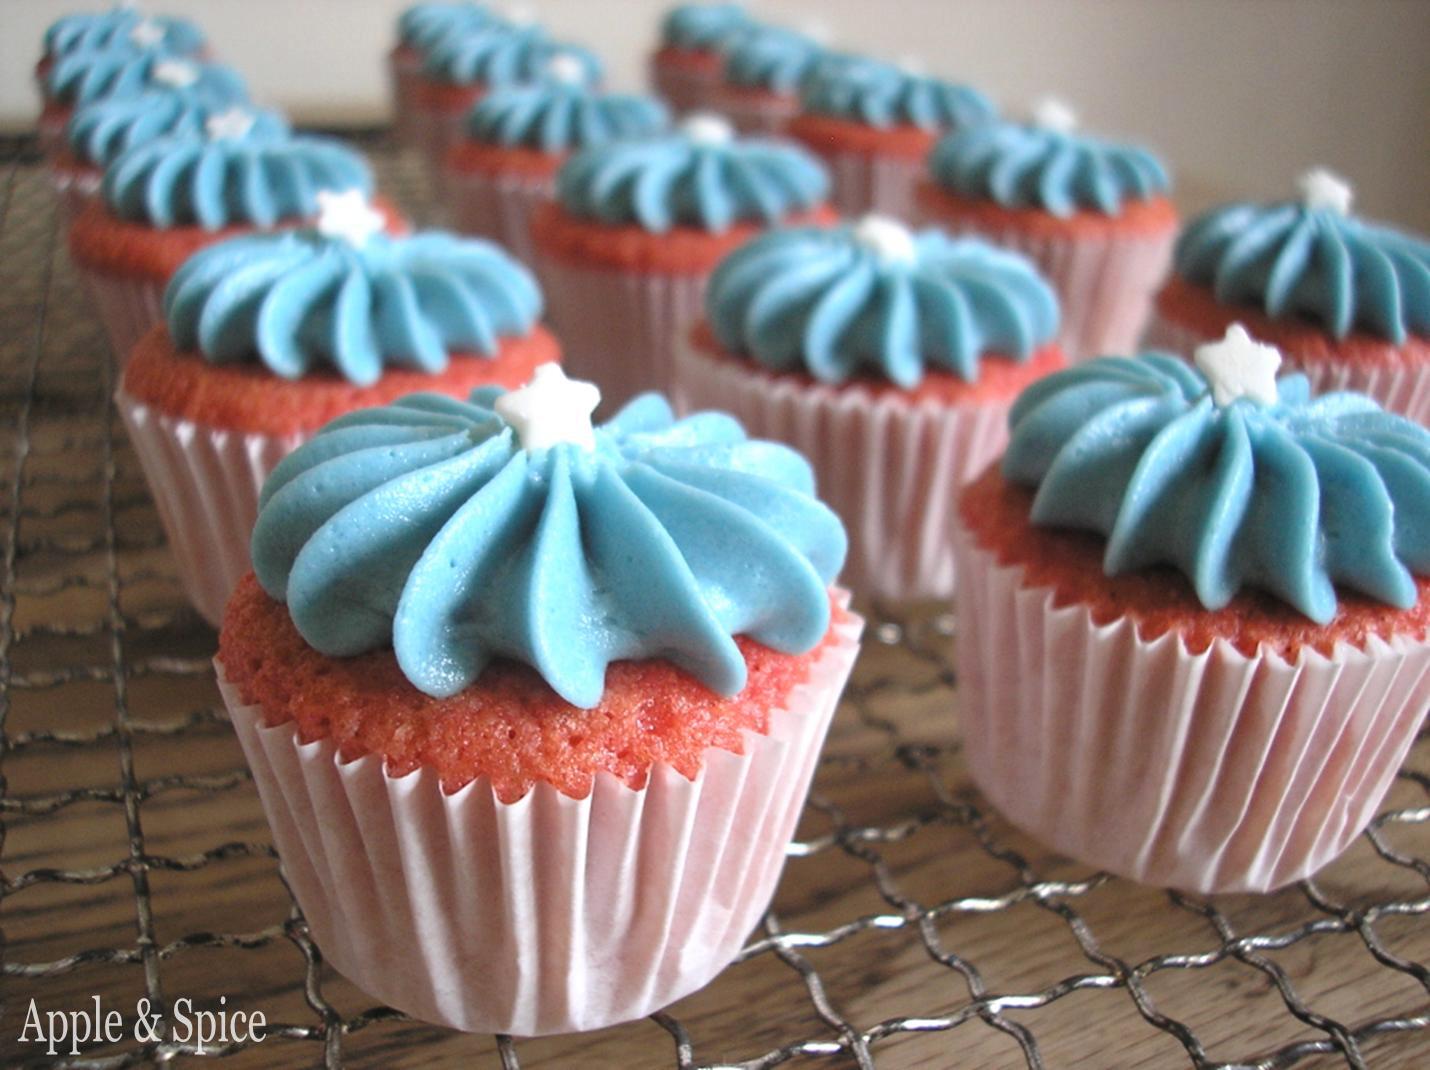 Apple & Spice: 4th July Mini Cupcakes